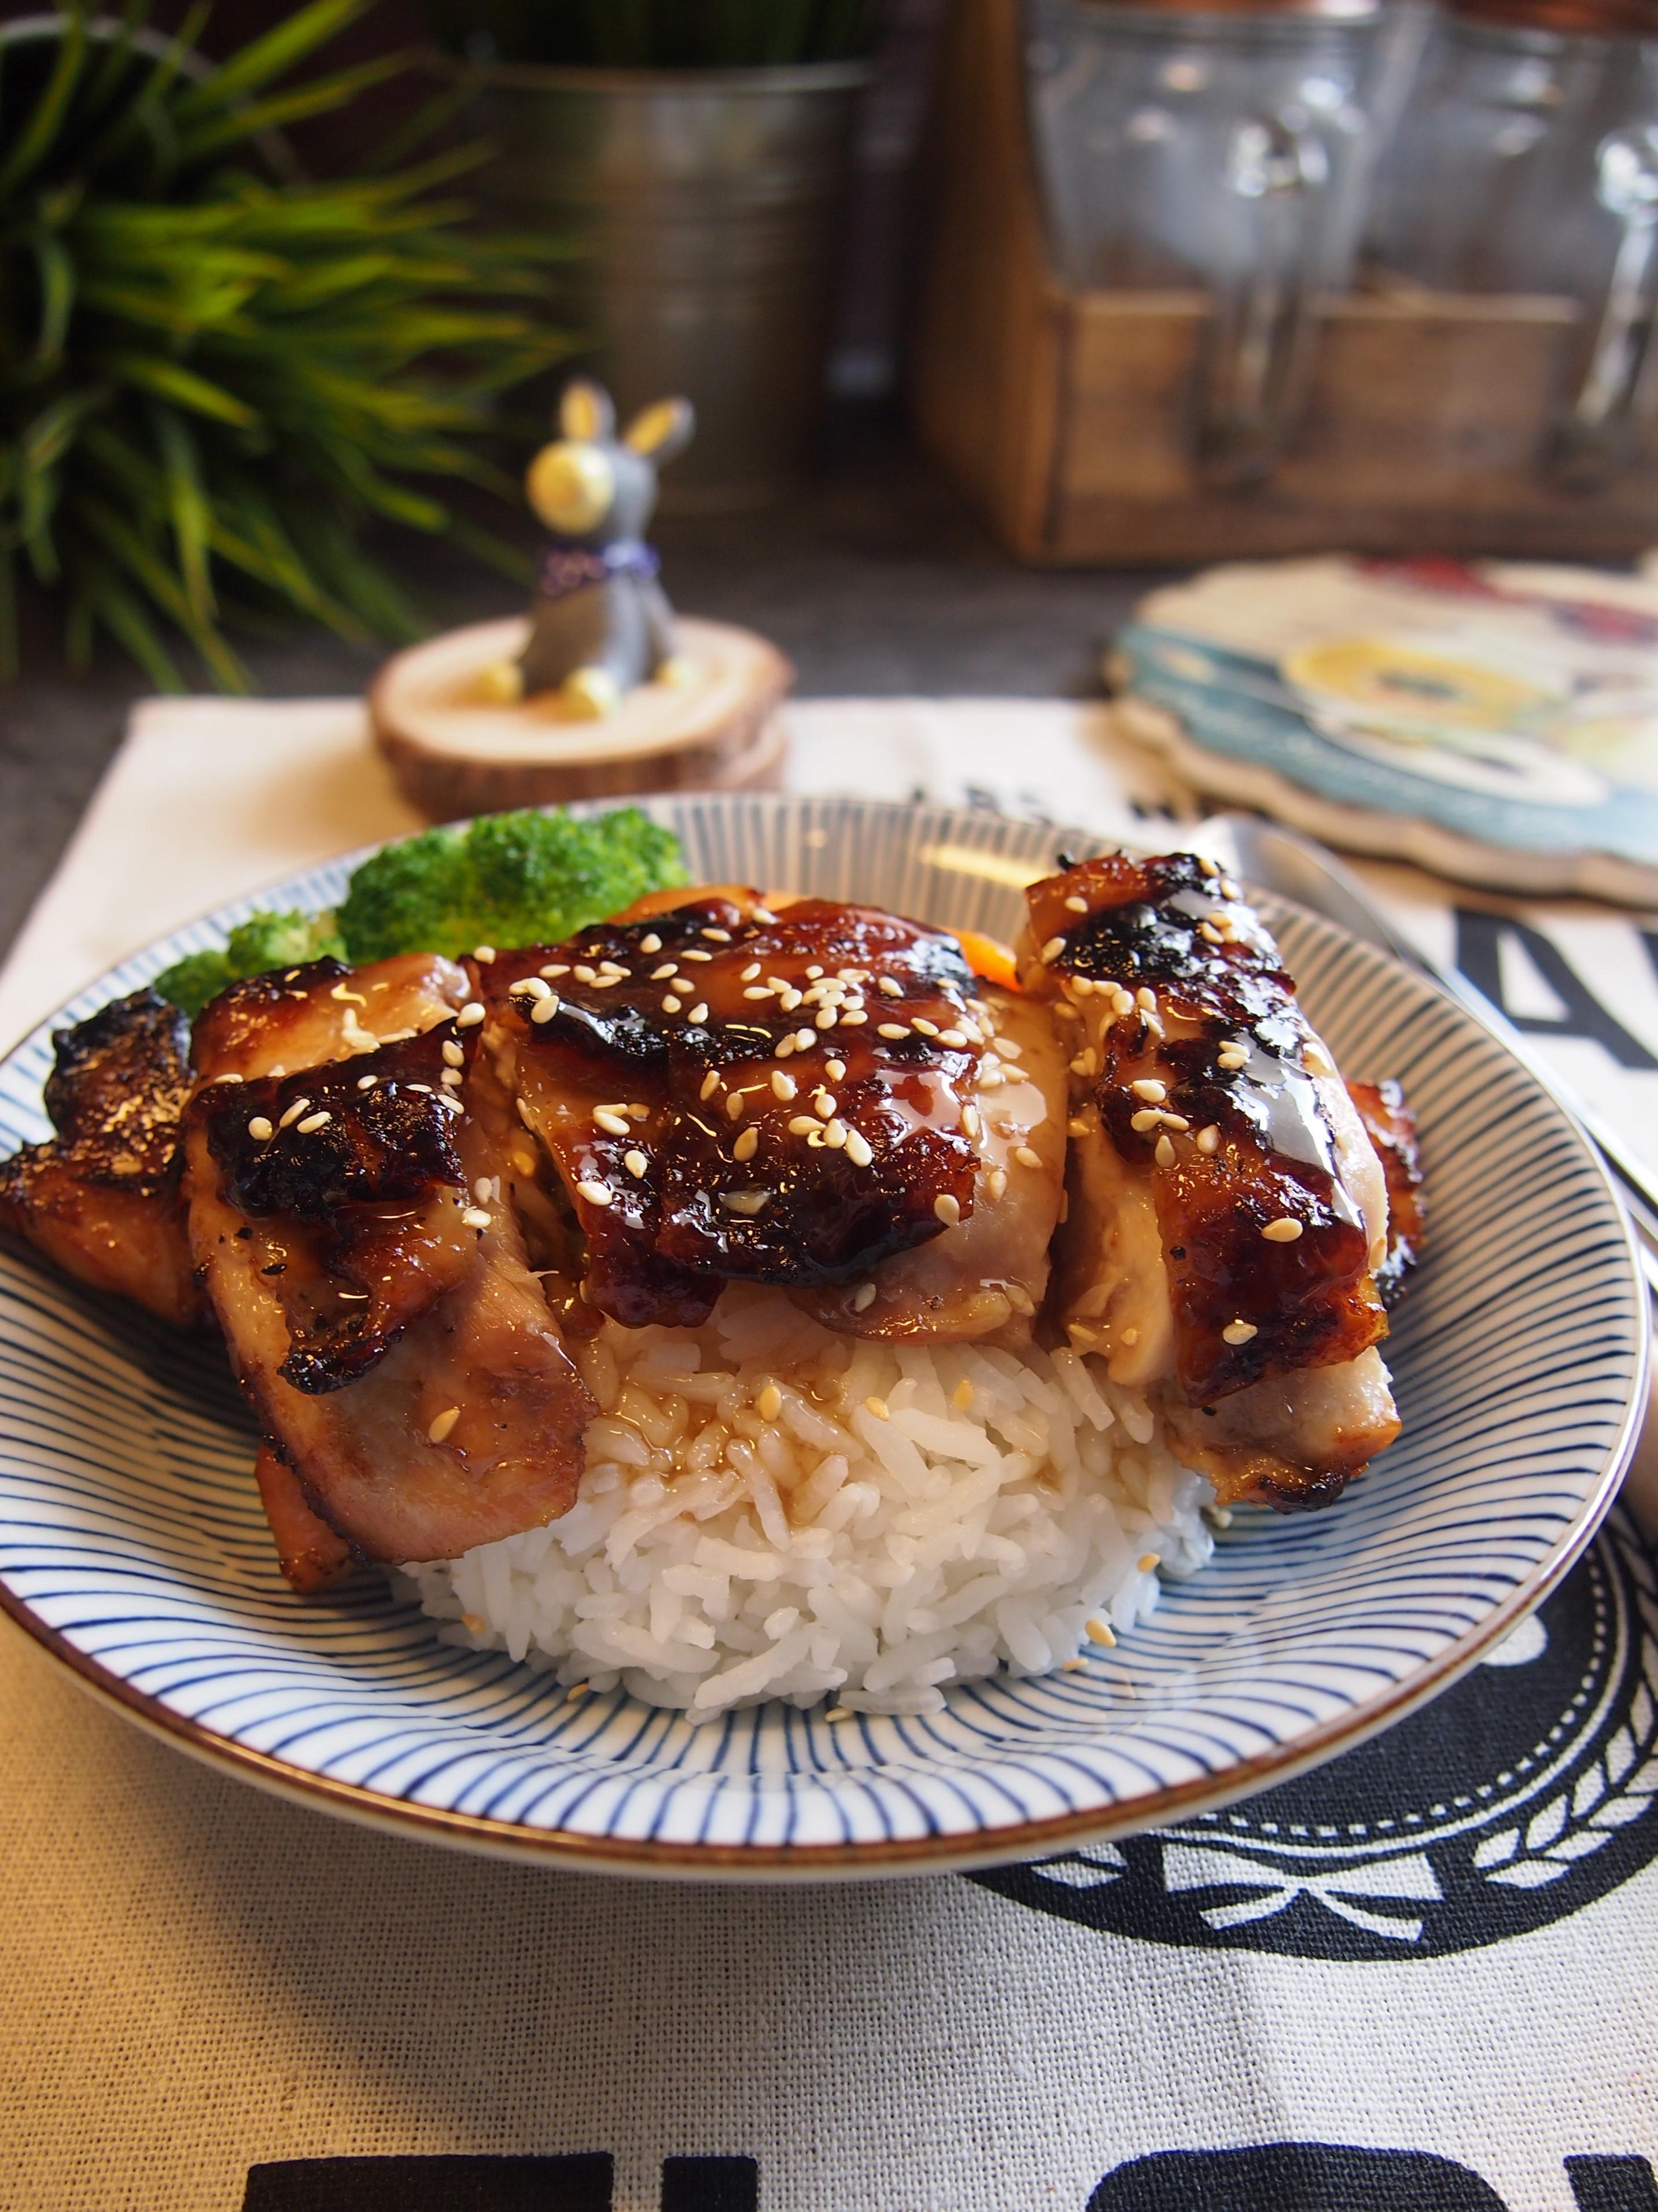 SUPER EASY Air fried Teriyaki Chicken